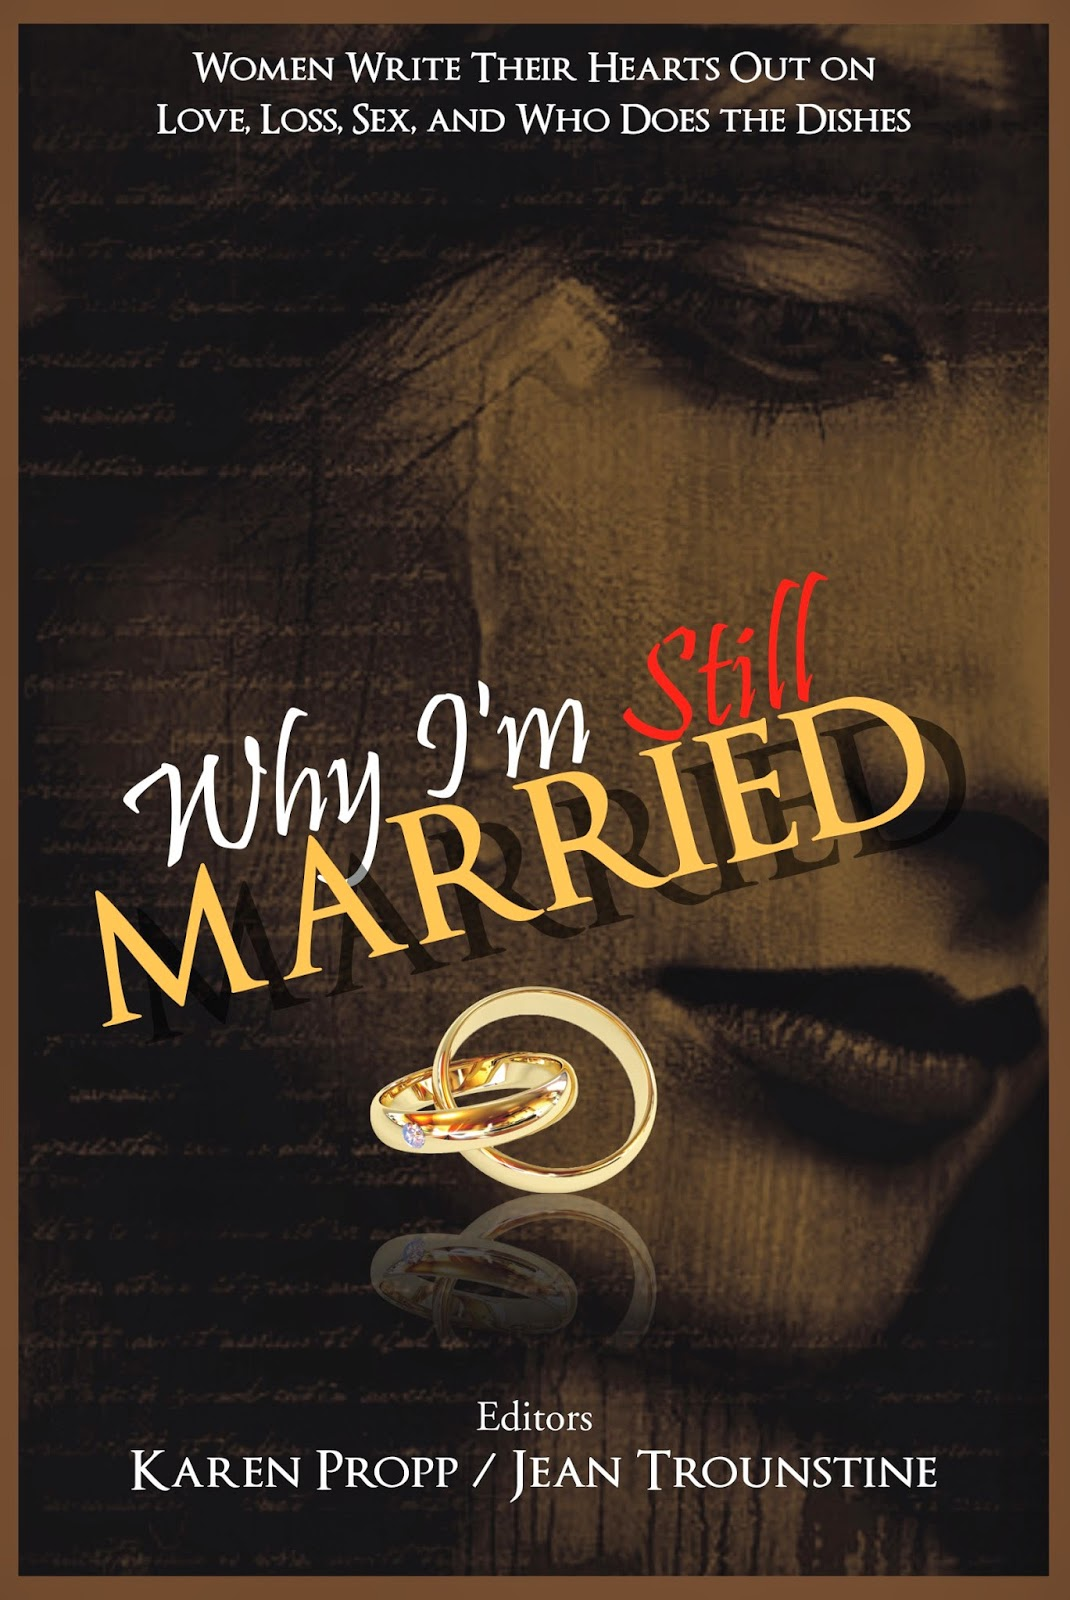 Why I'm Still Married by Karen Propp & Jean Trounstine